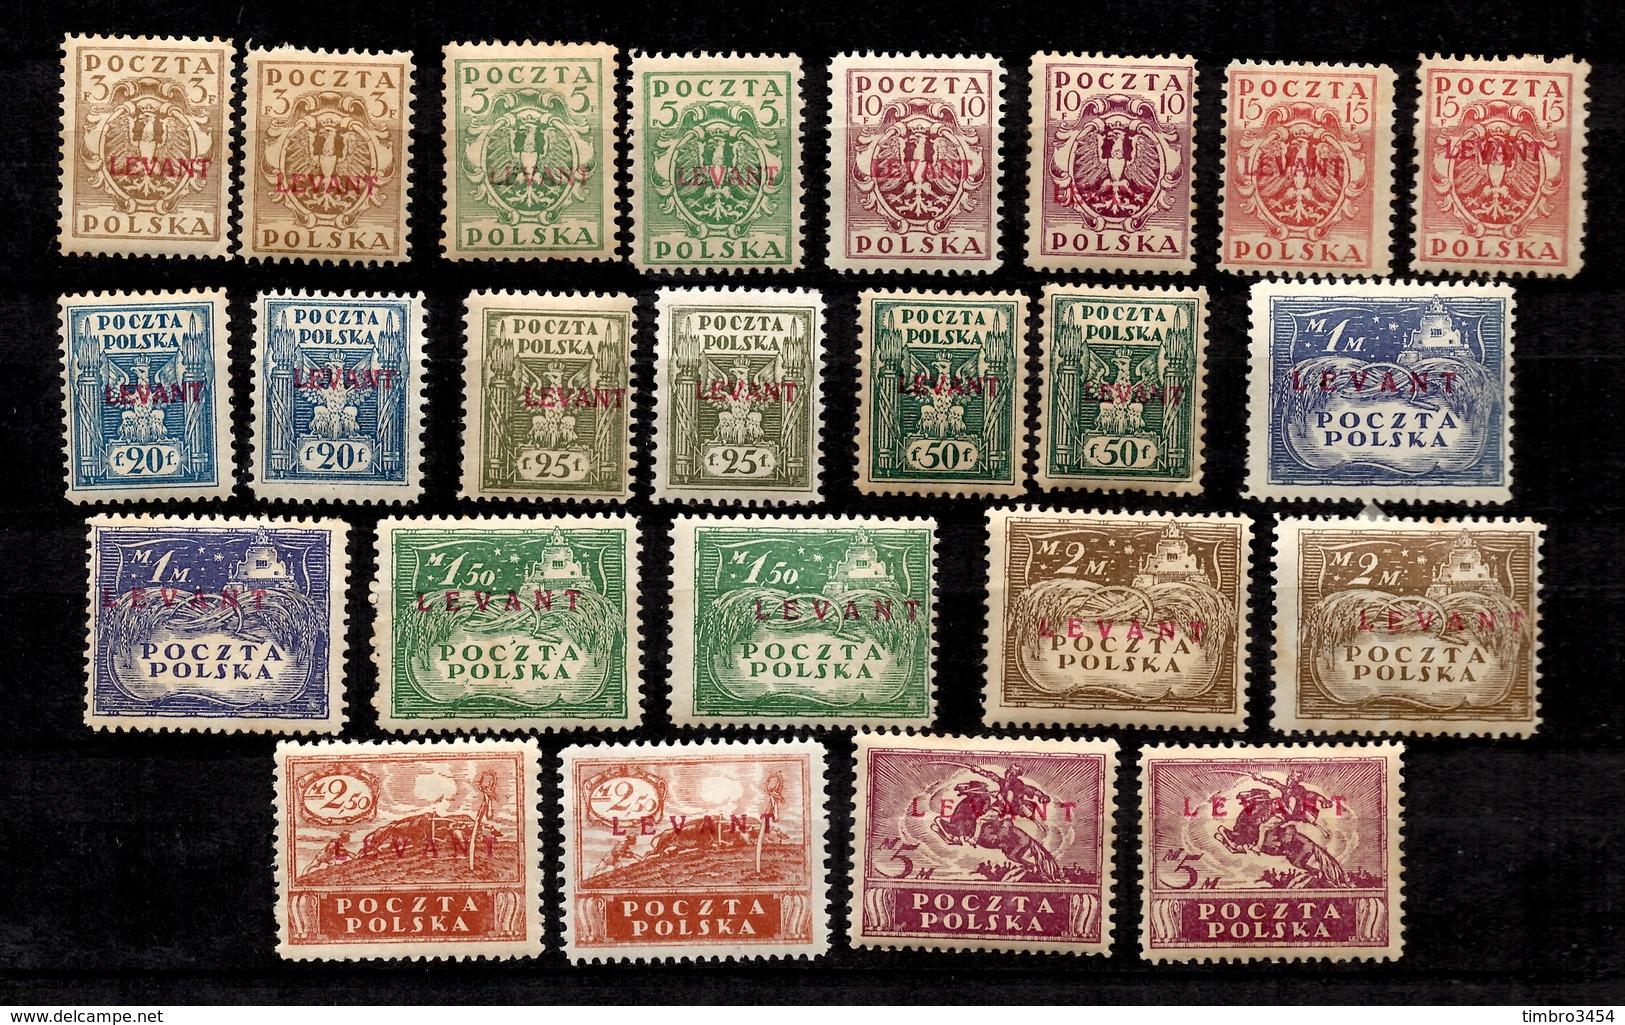 Levant Polonais YT N° 1/12 Deux Séries Neufs *. A Voir! - Levant (Turkey)